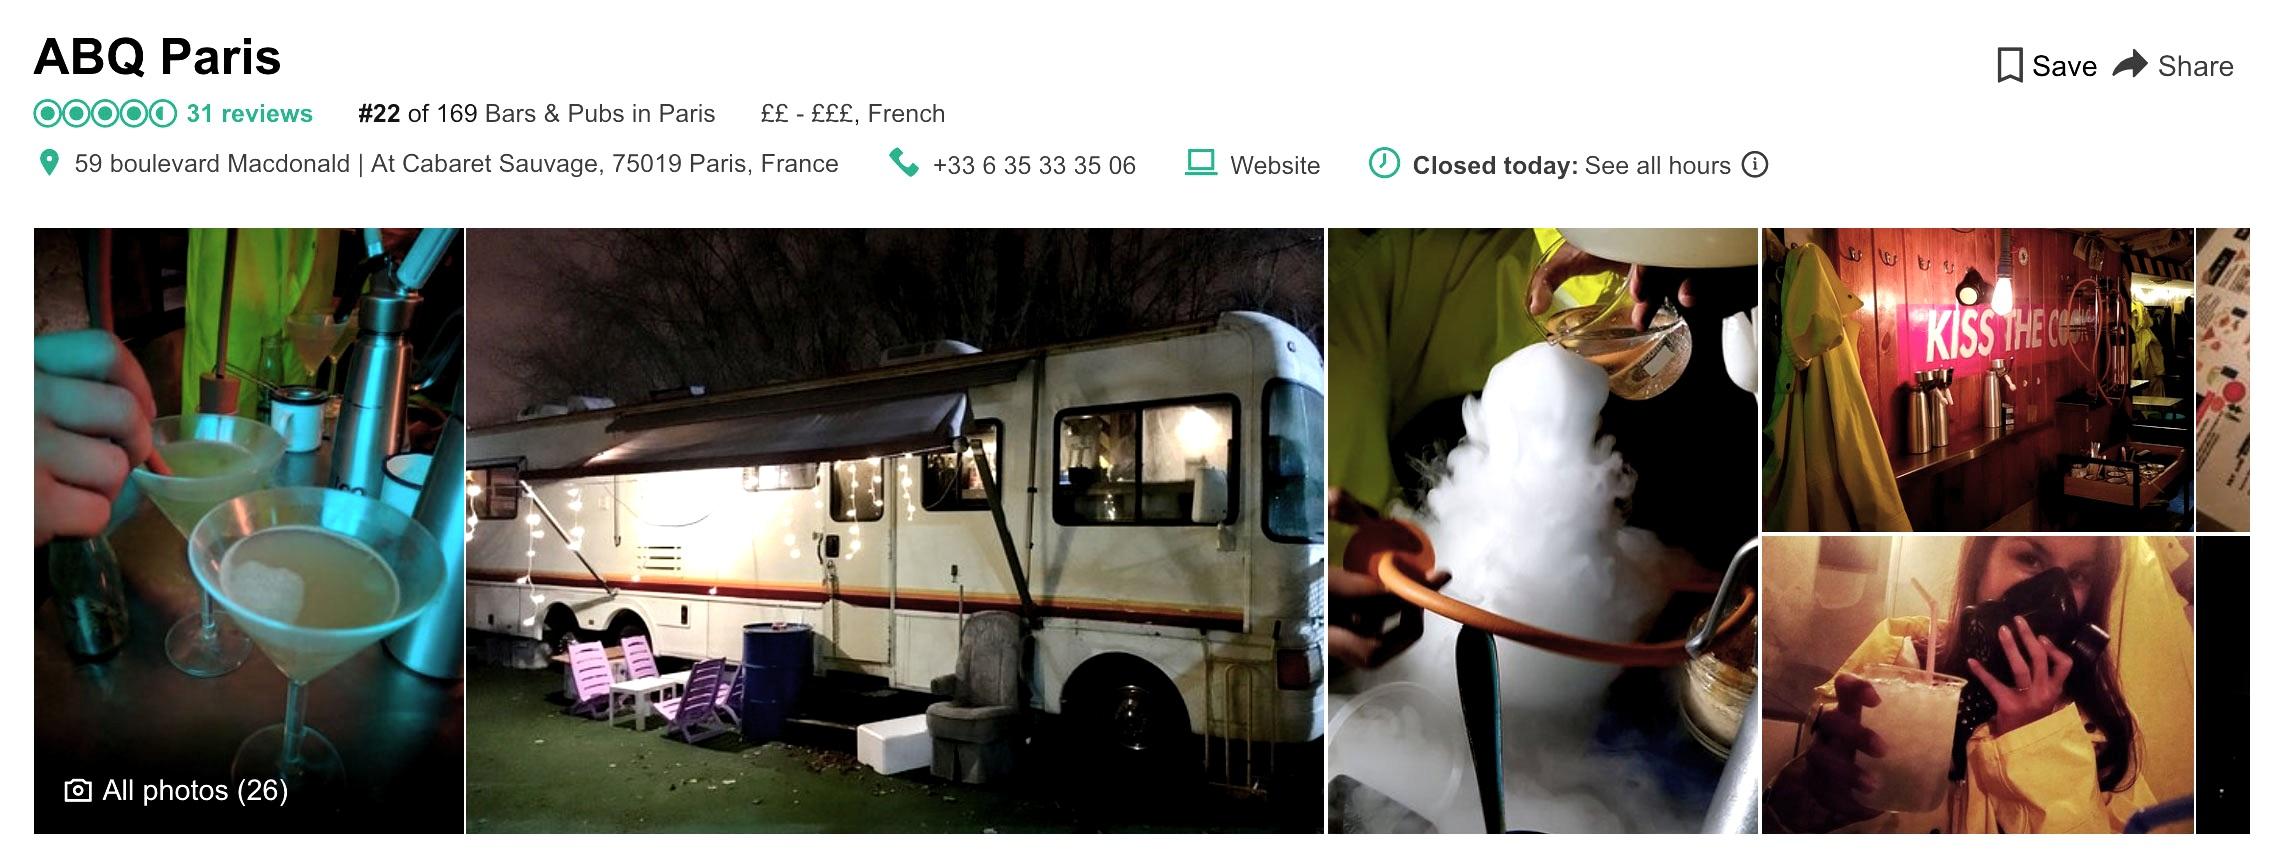 Screen-Shot-2019-01-15-at-14.21.40.jpg